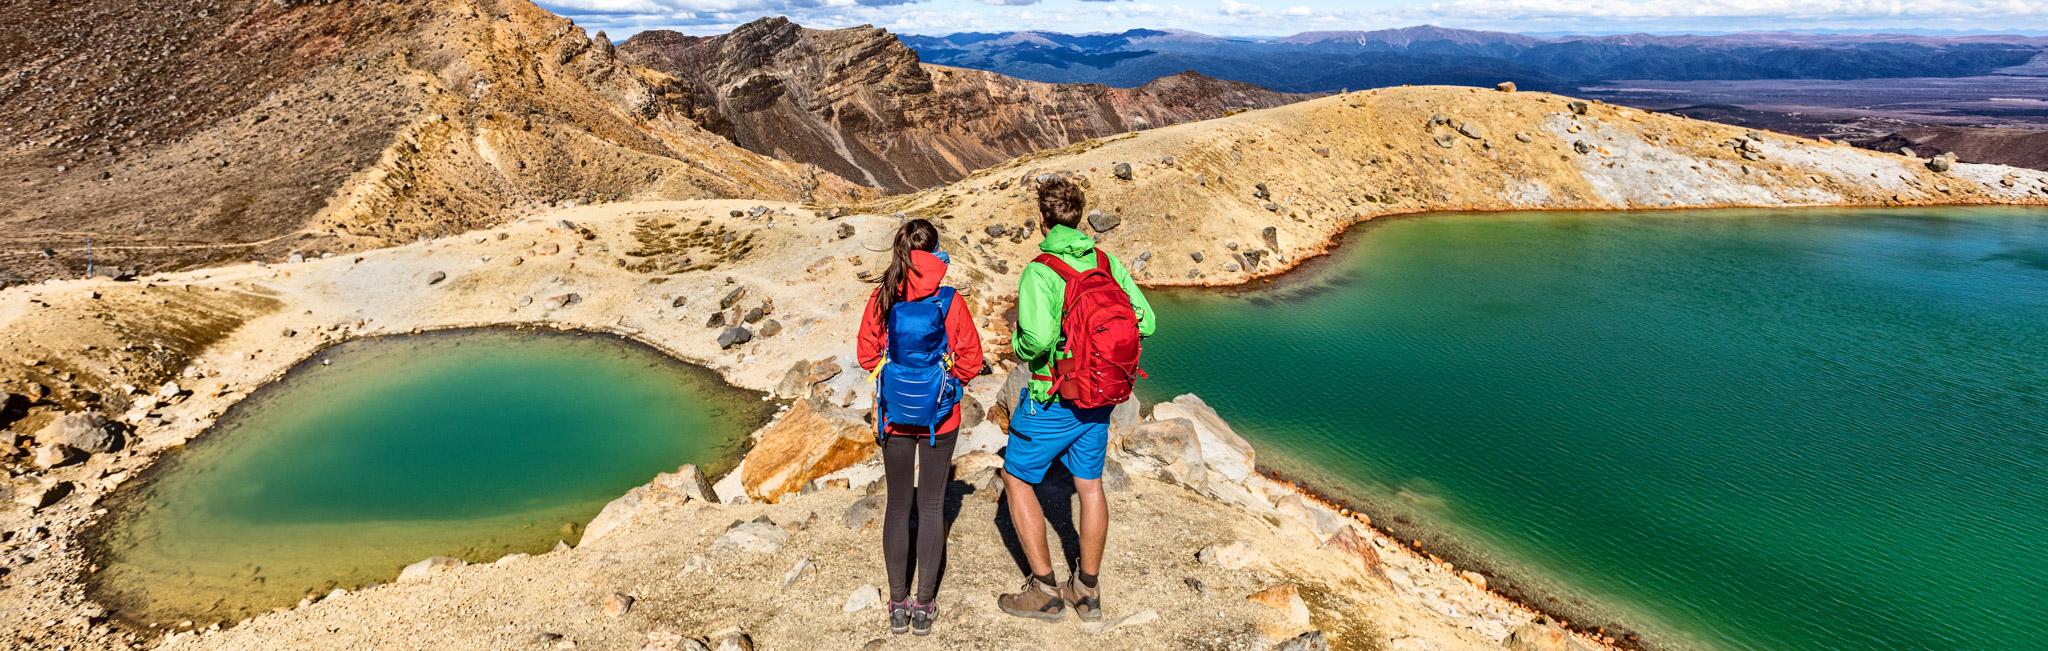 New Zealand Tours - Alpine Crossing in Tongariro National Park